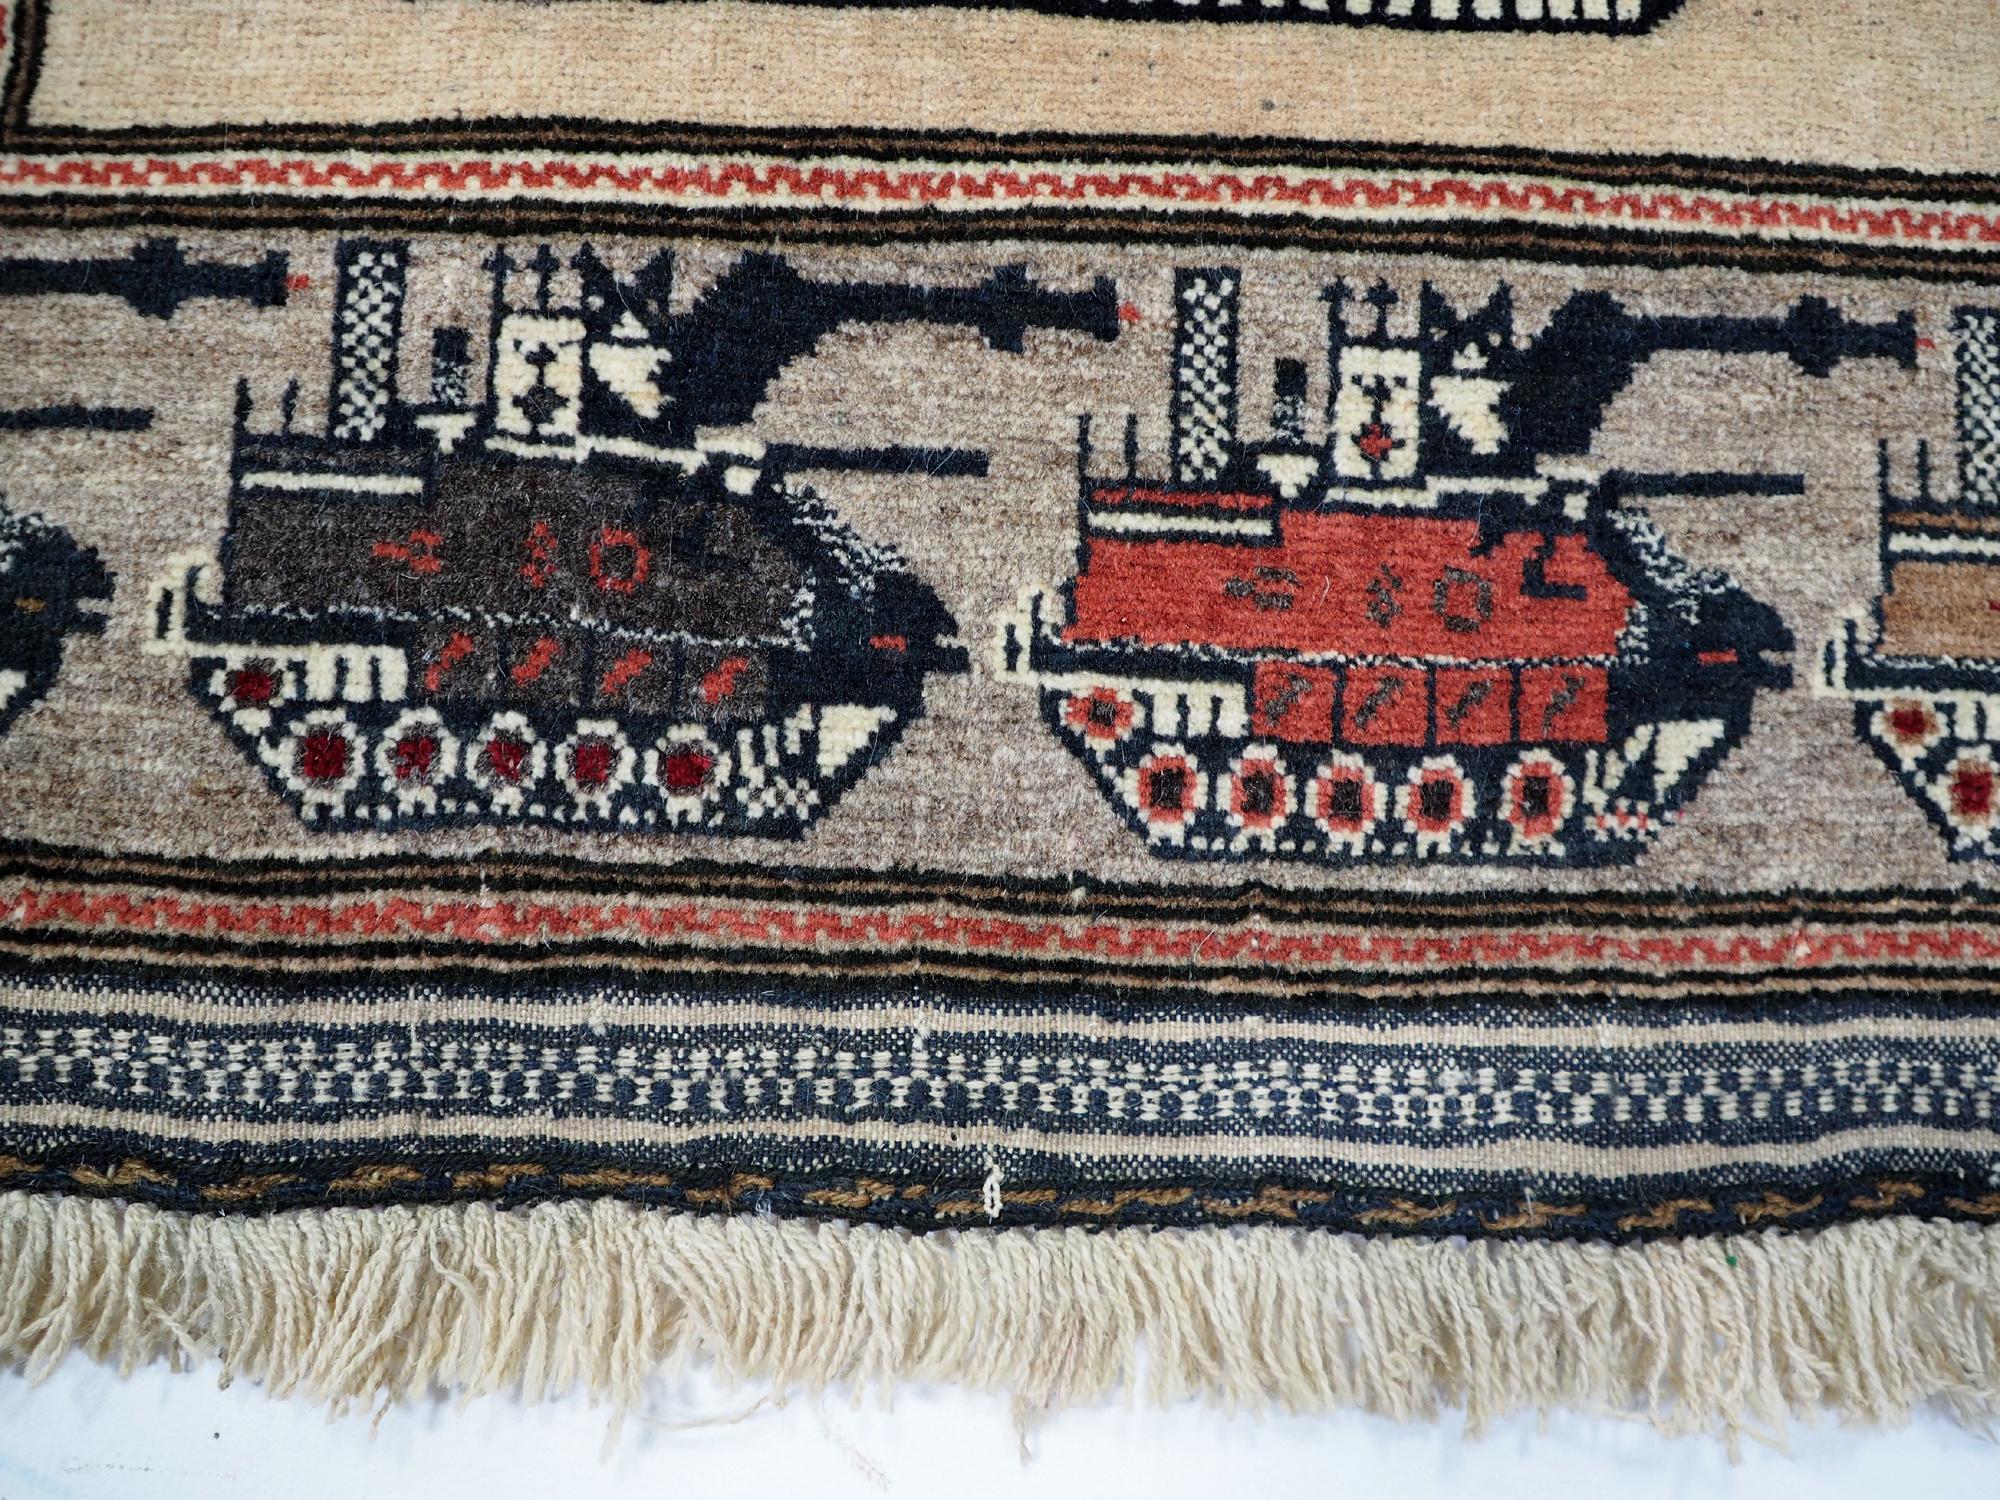 Afghan Kriegteppich Handgeknüpf Teppich Afghanistan panzer kampfjet gewehr USA Army Nato ISAF war rug Nr:19/ 28